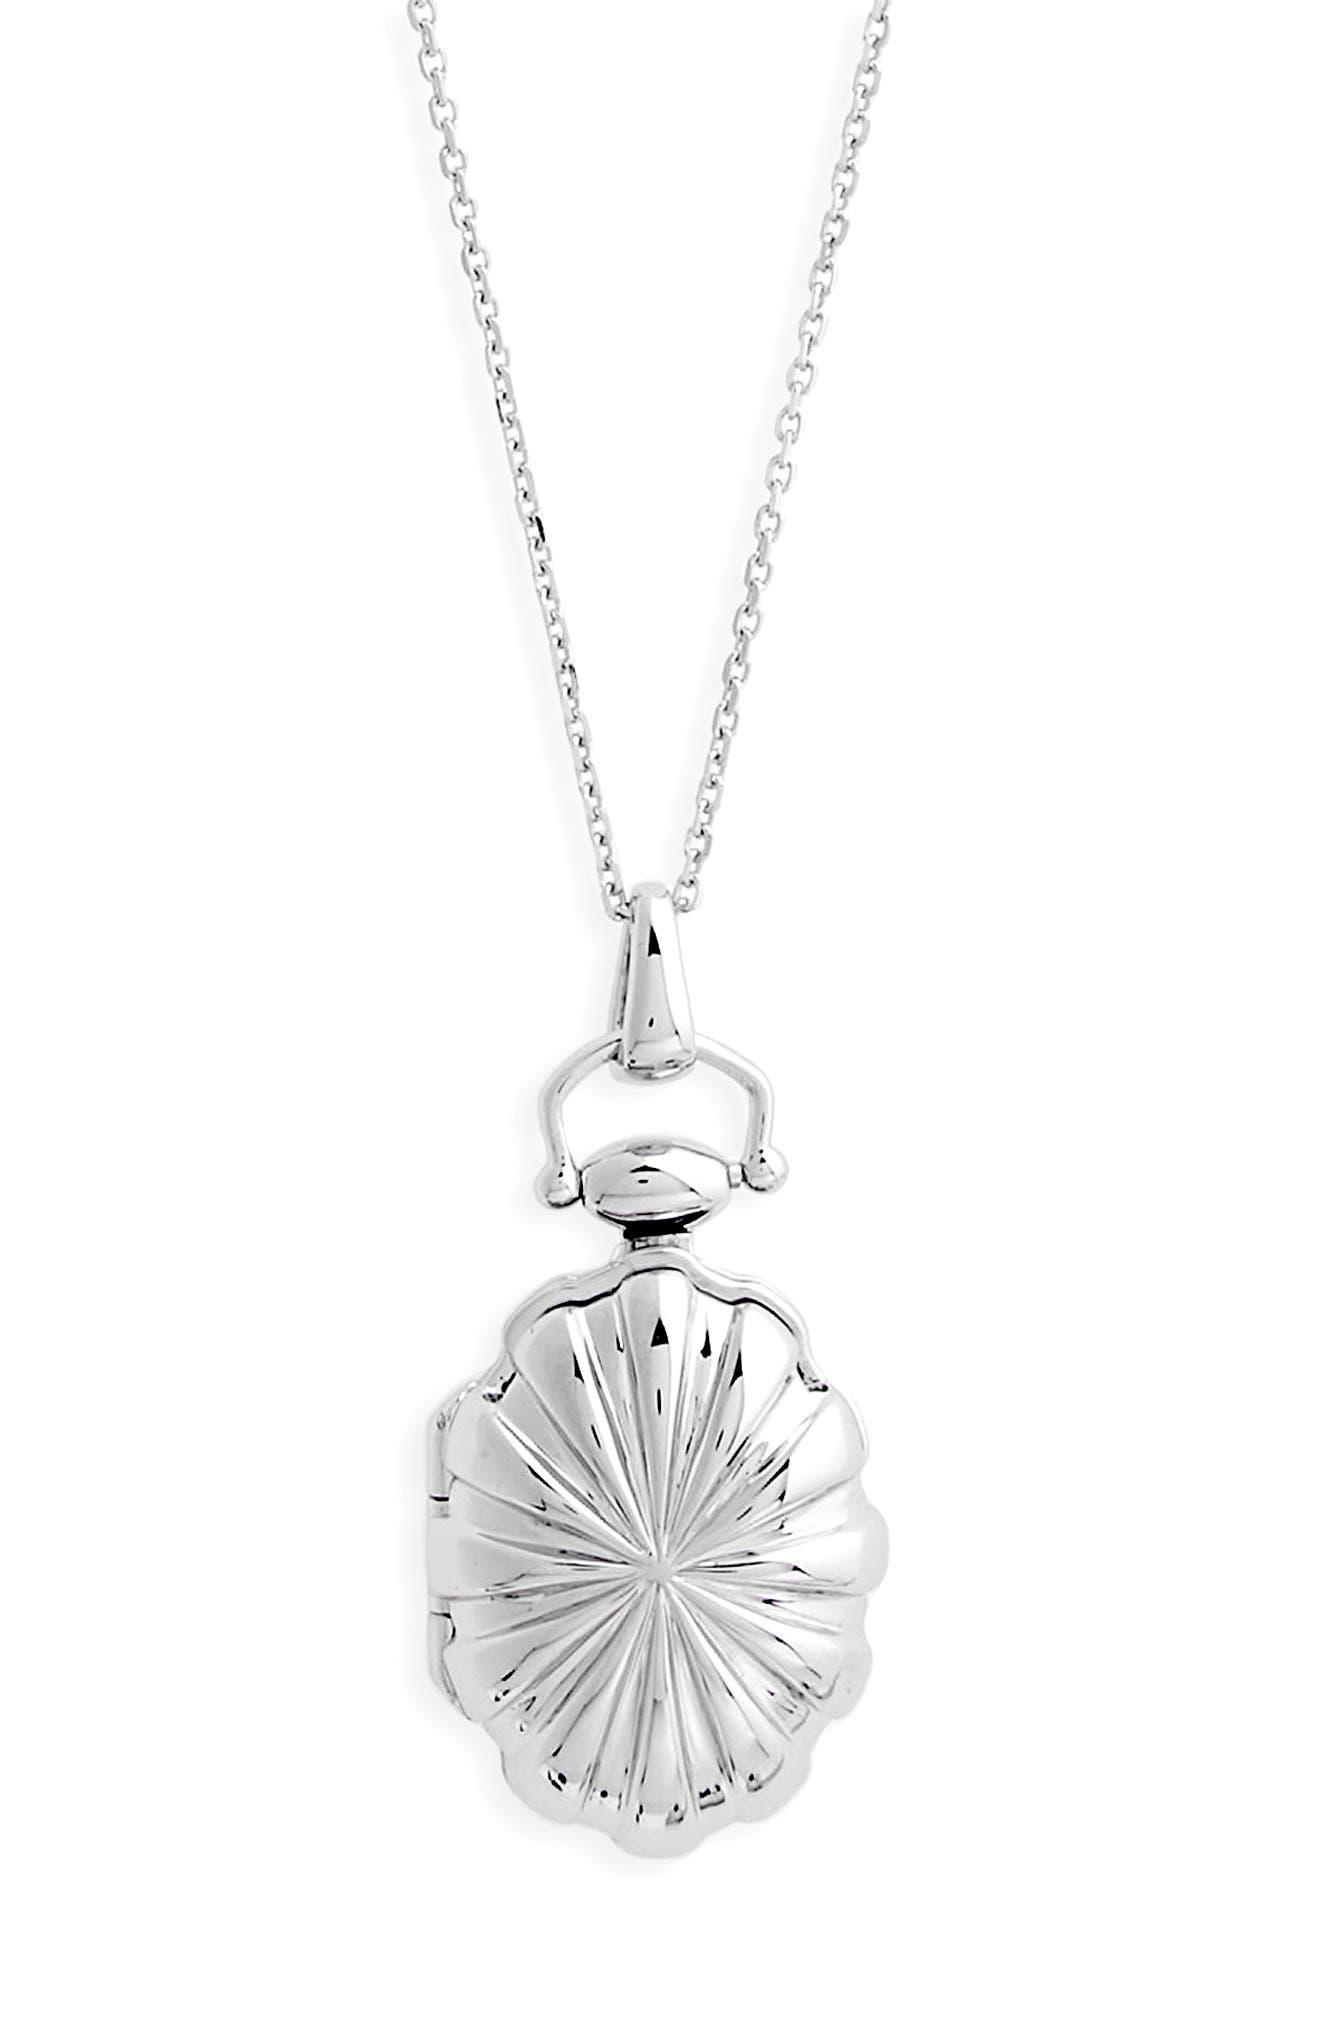 Petite Sunburst Locket Necklace,                         Main,                         color, STERLING SILVER